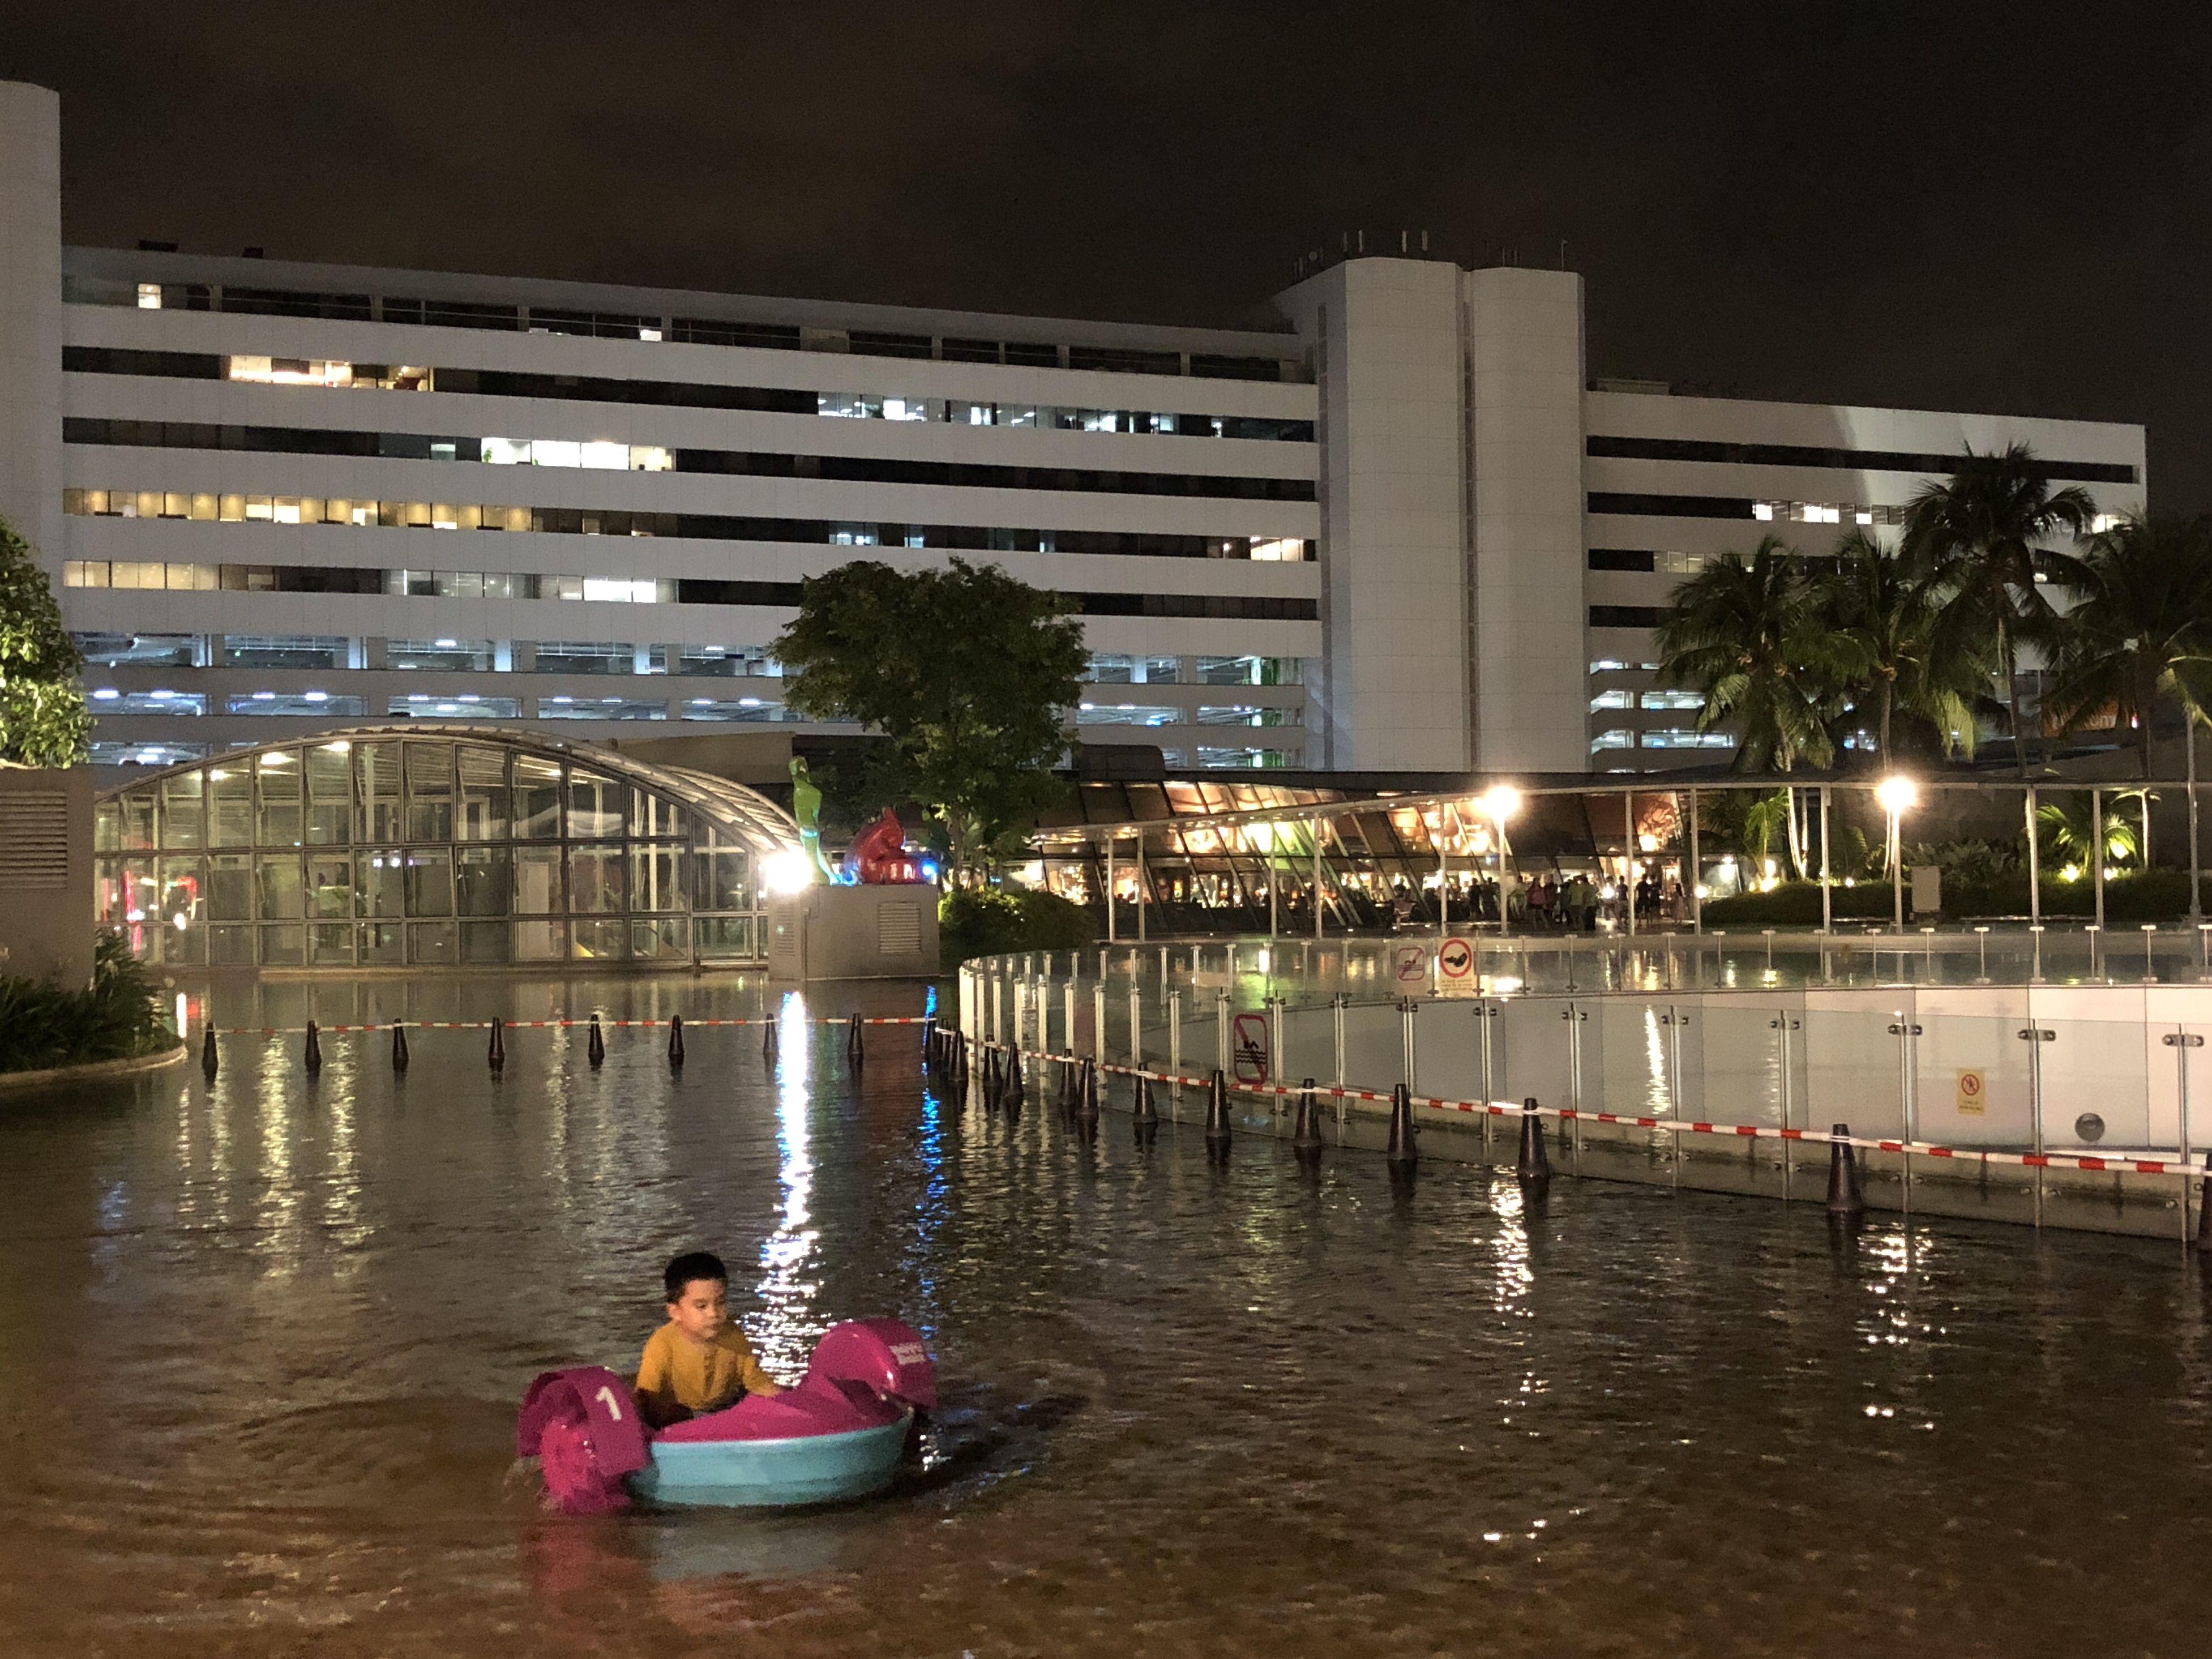 VivoCity Address 1 Harbourfront Walk, Singapore 098585